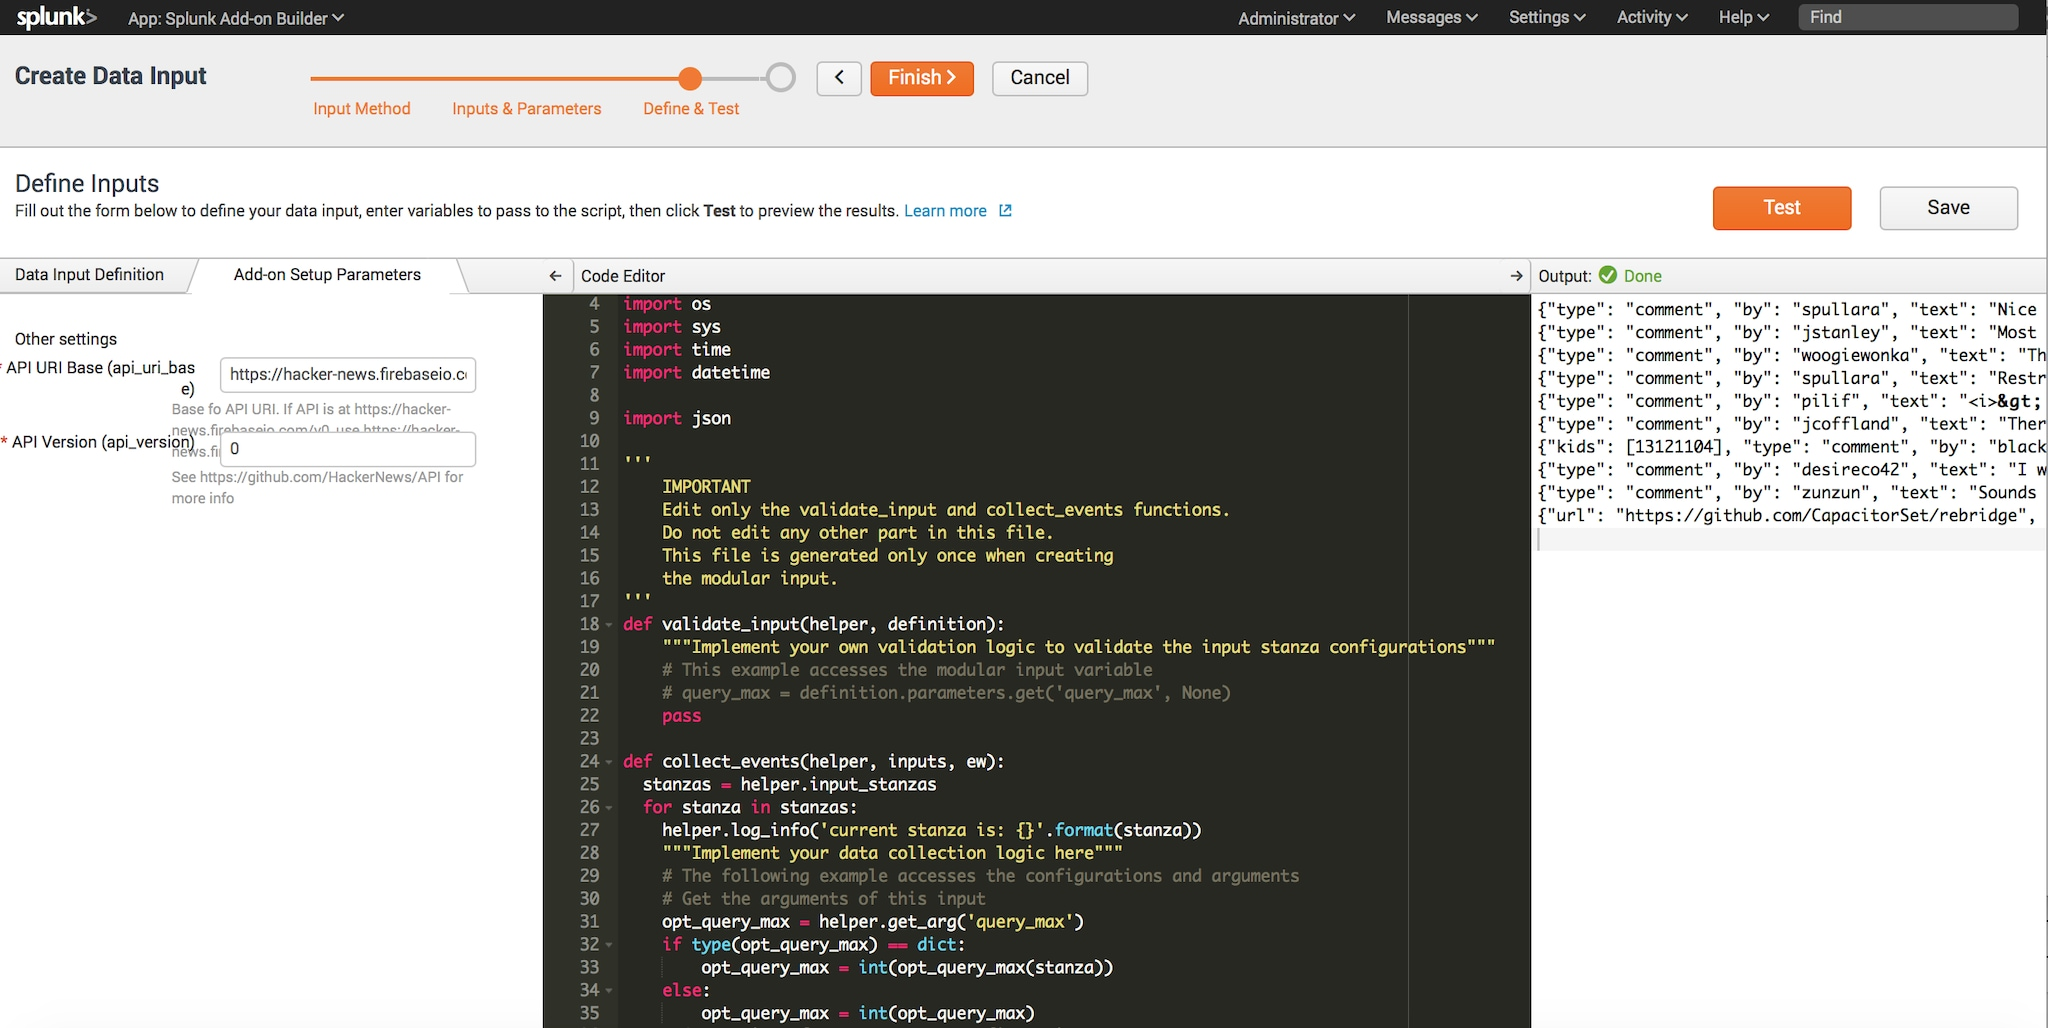 Easily Create Mod Inputs Using Splunk Add-on Builder 2 0 – Part IV